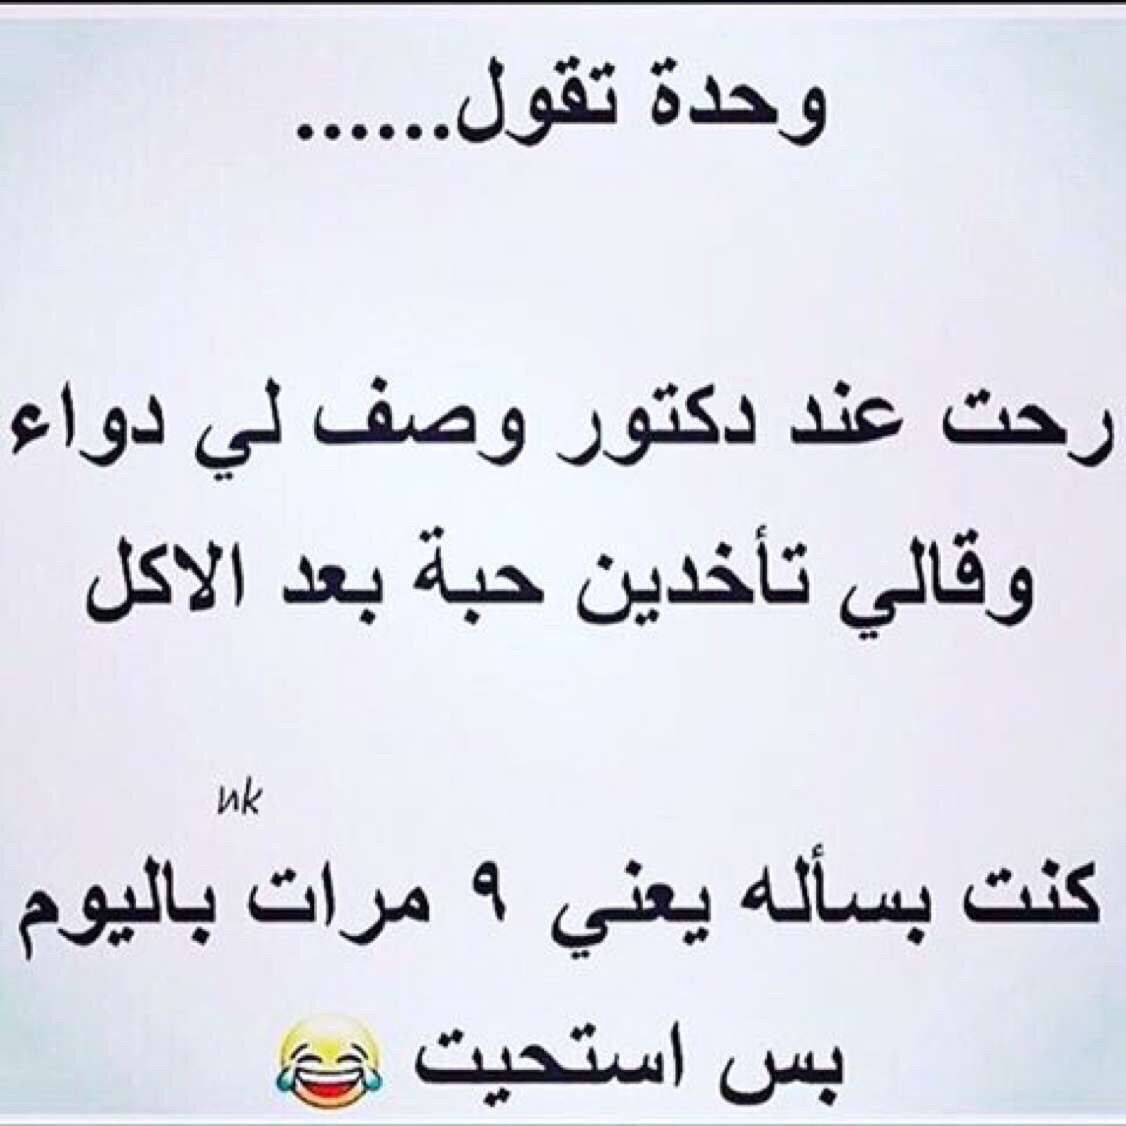 Pin By Ghadah Ghammas On نكت Funny Study Quotes Funny Quotes Fun Quotes Funny